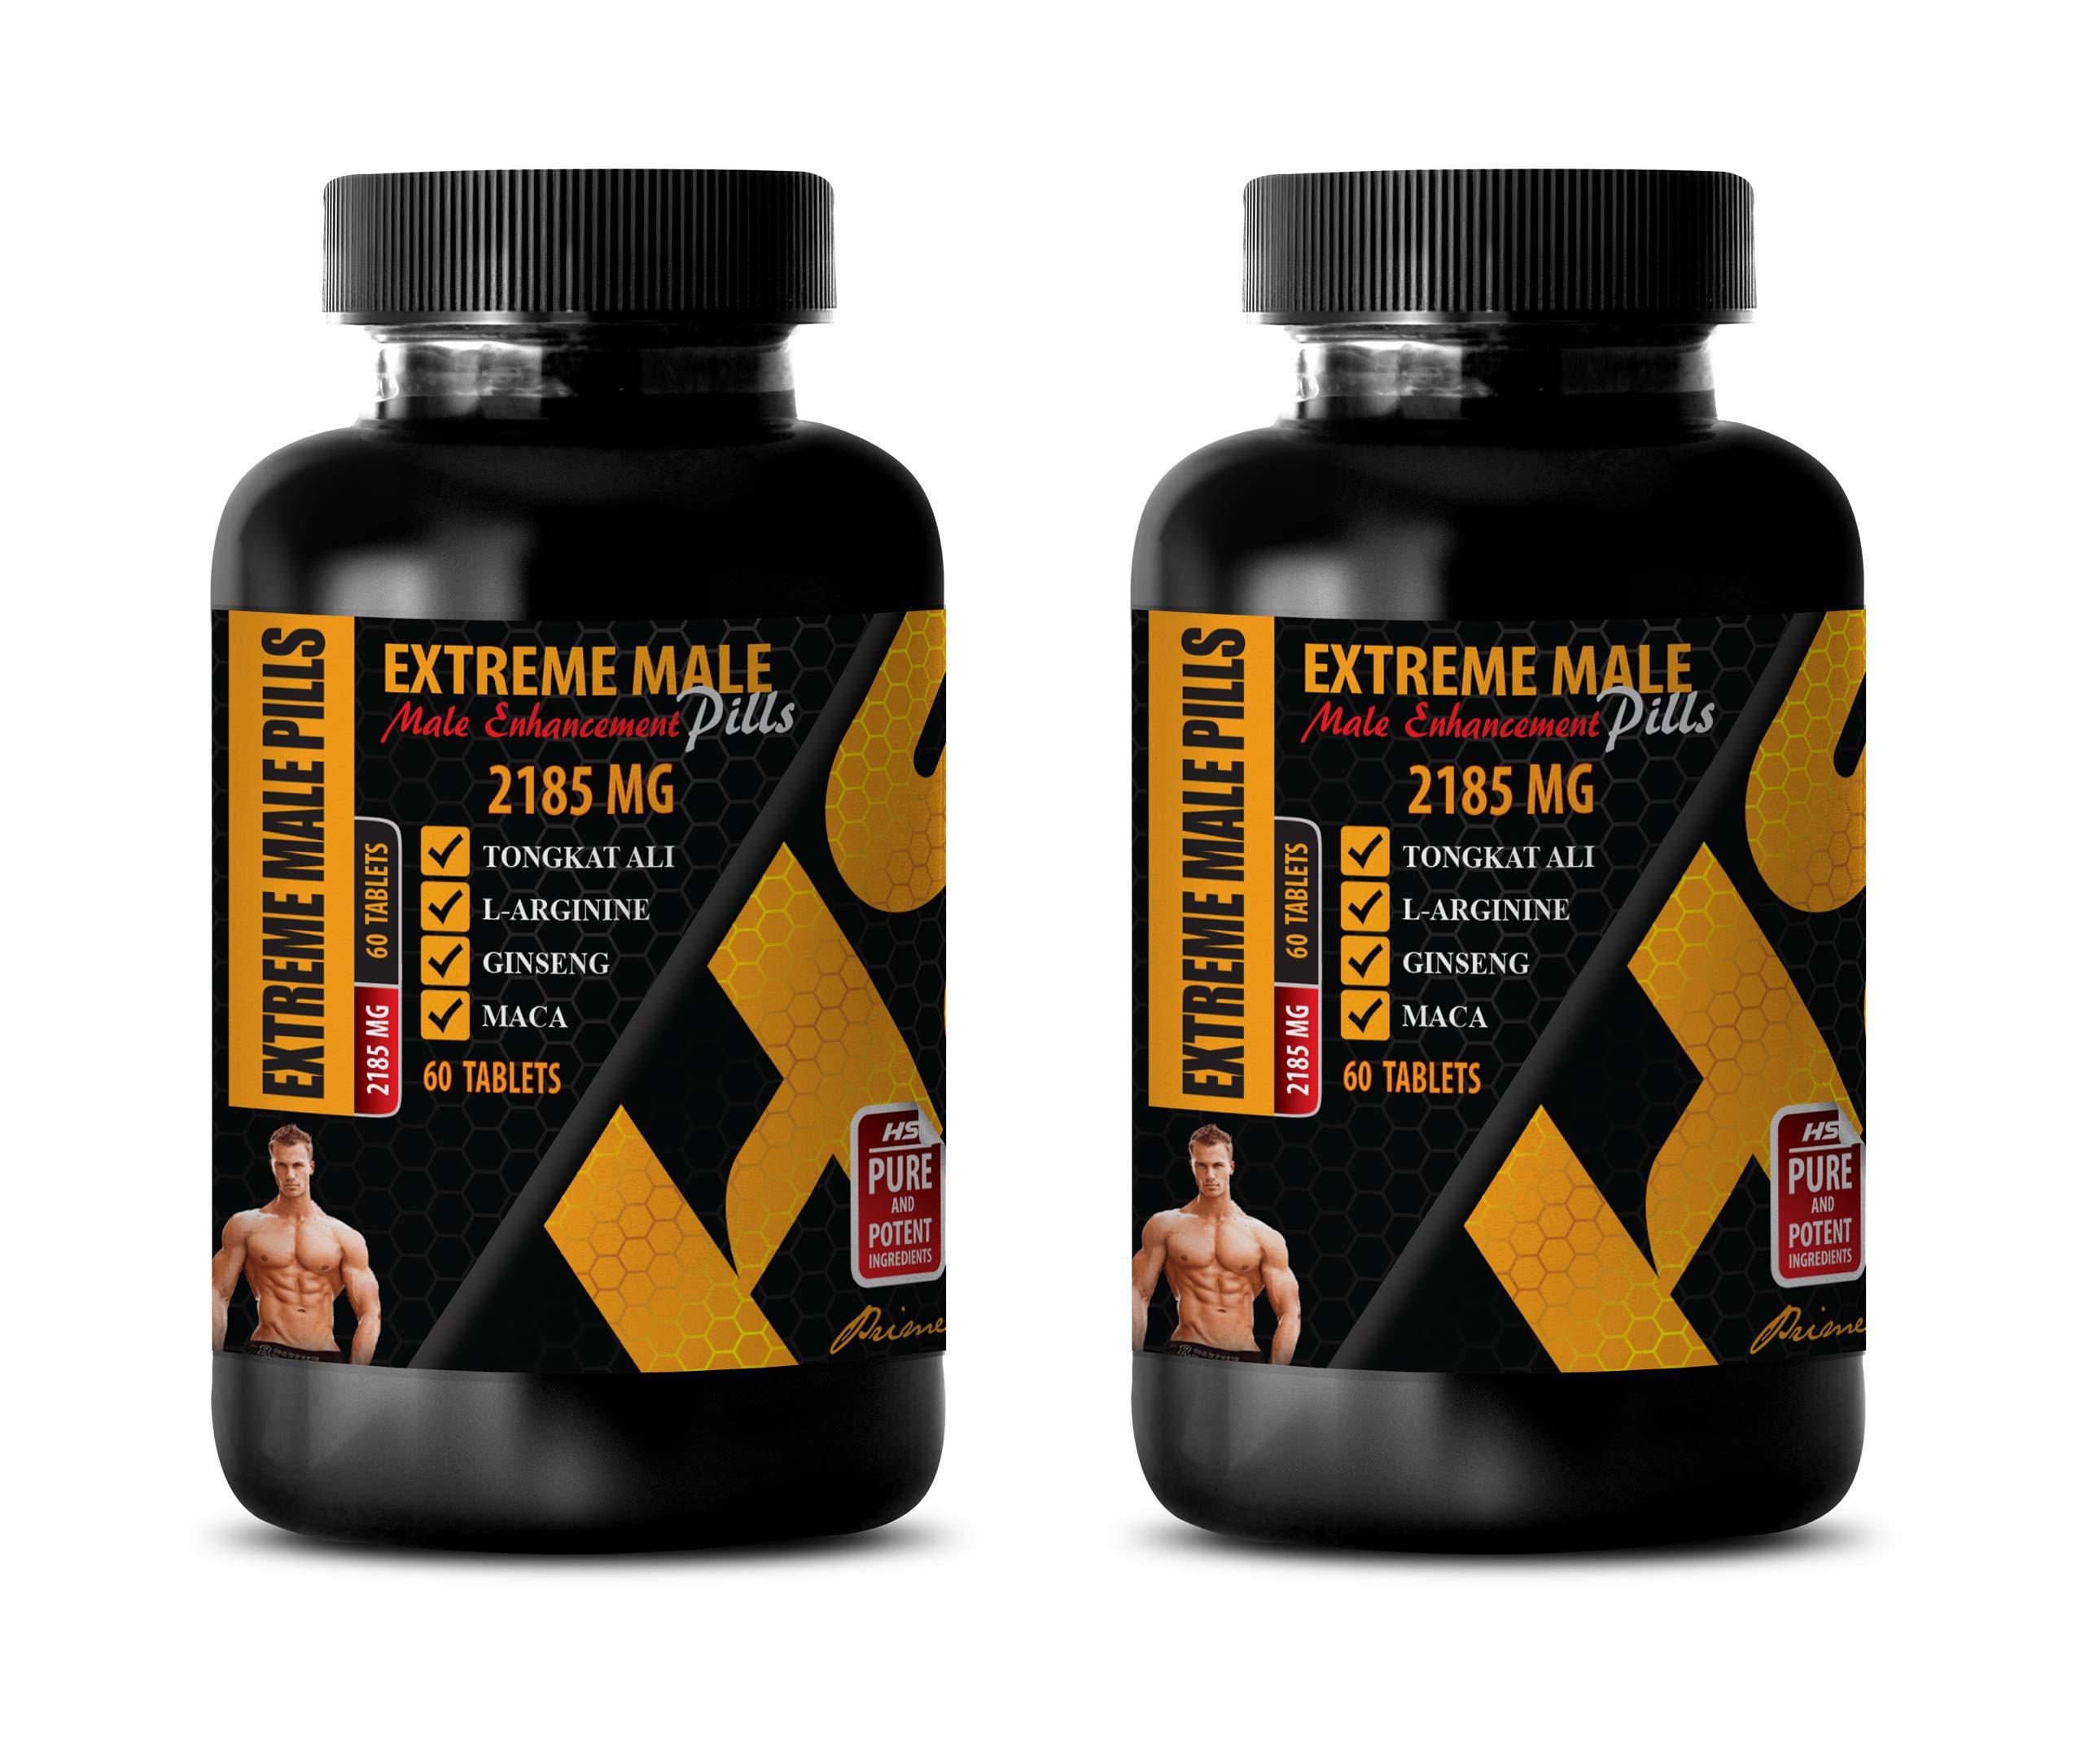 Amazon.com: Male Enhancing Pills Erection Best Seller - Extreme Male Enhancement Pills - tongkat Ali him Supplements - 2 Bottles 120 Tablets: Health ...